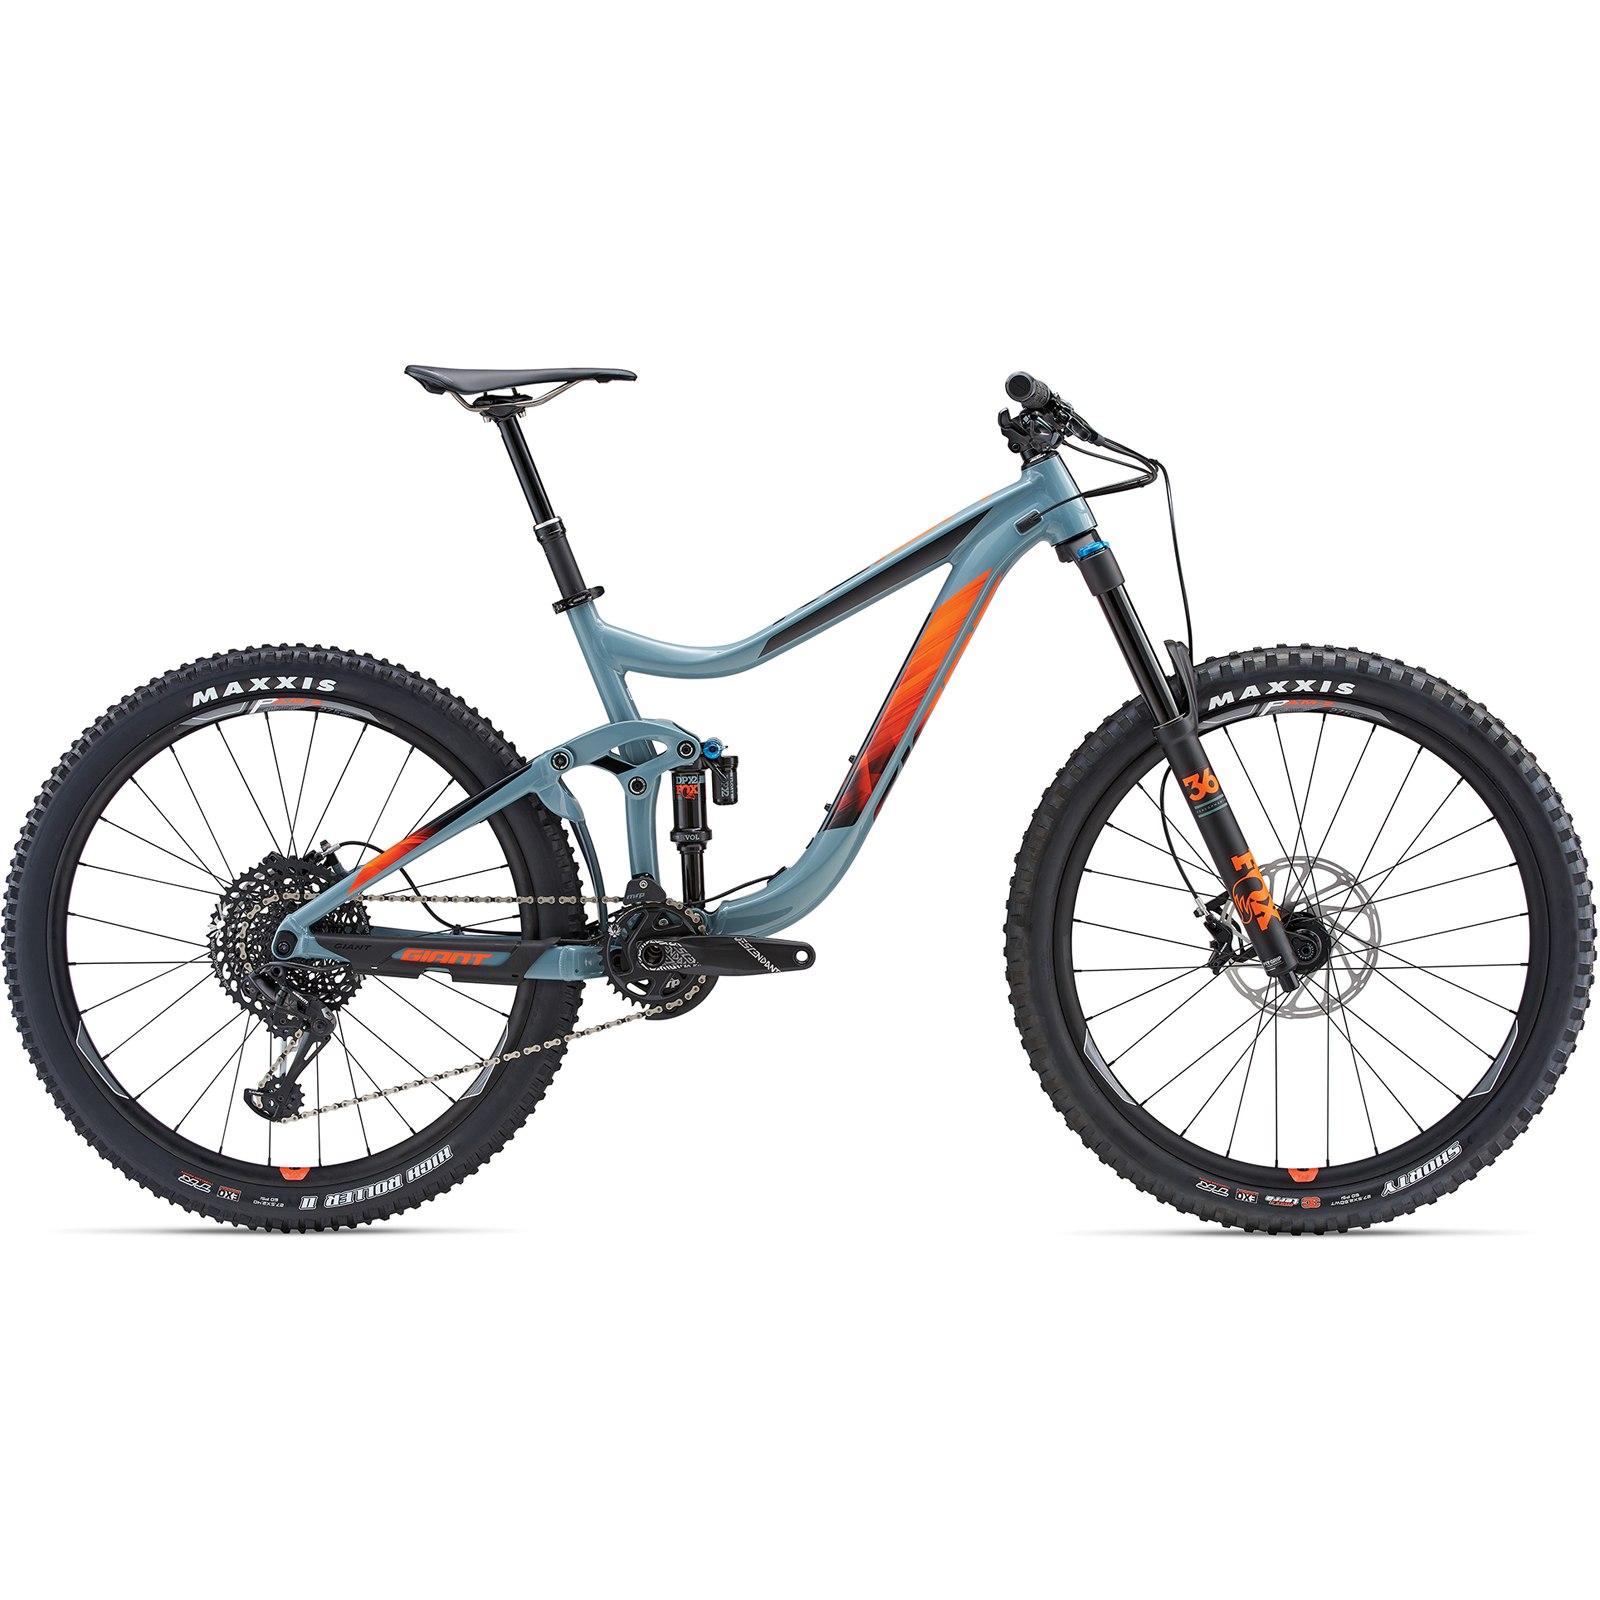 Giant REIGN 1.5 GE LTD Mountainbike - 2018 - matte gray/neon orange